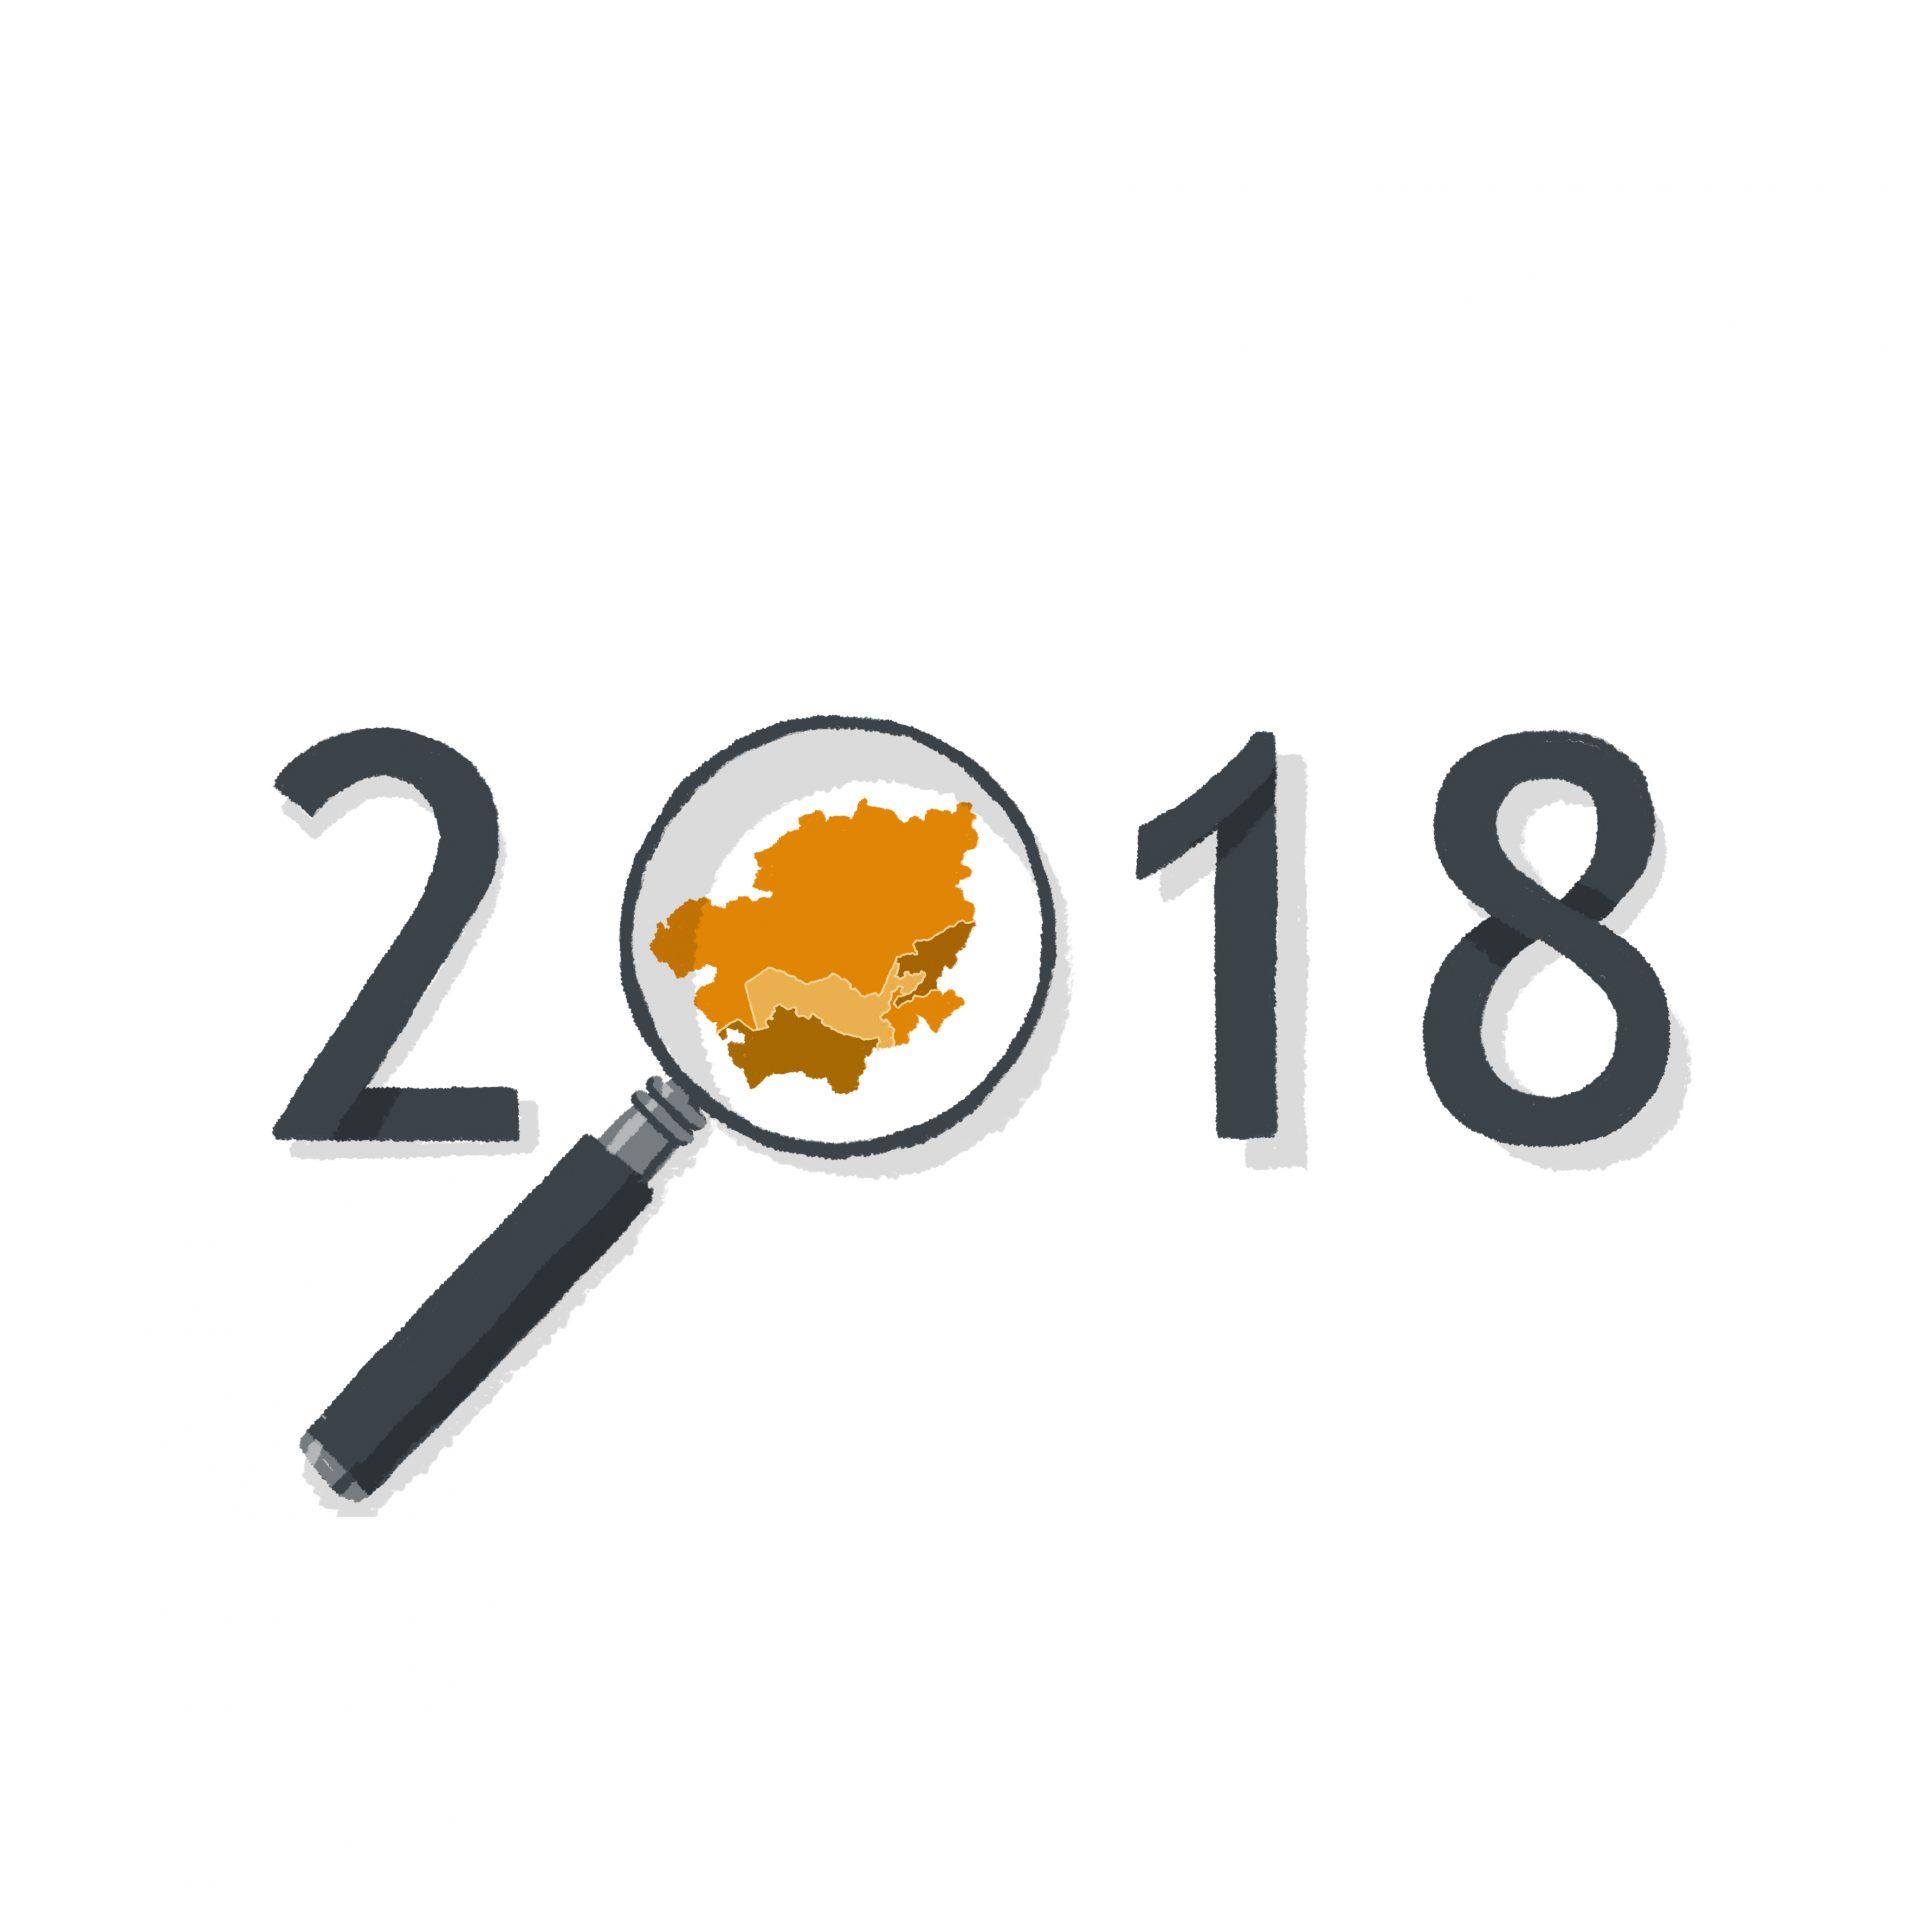 2018centralasia.jpg